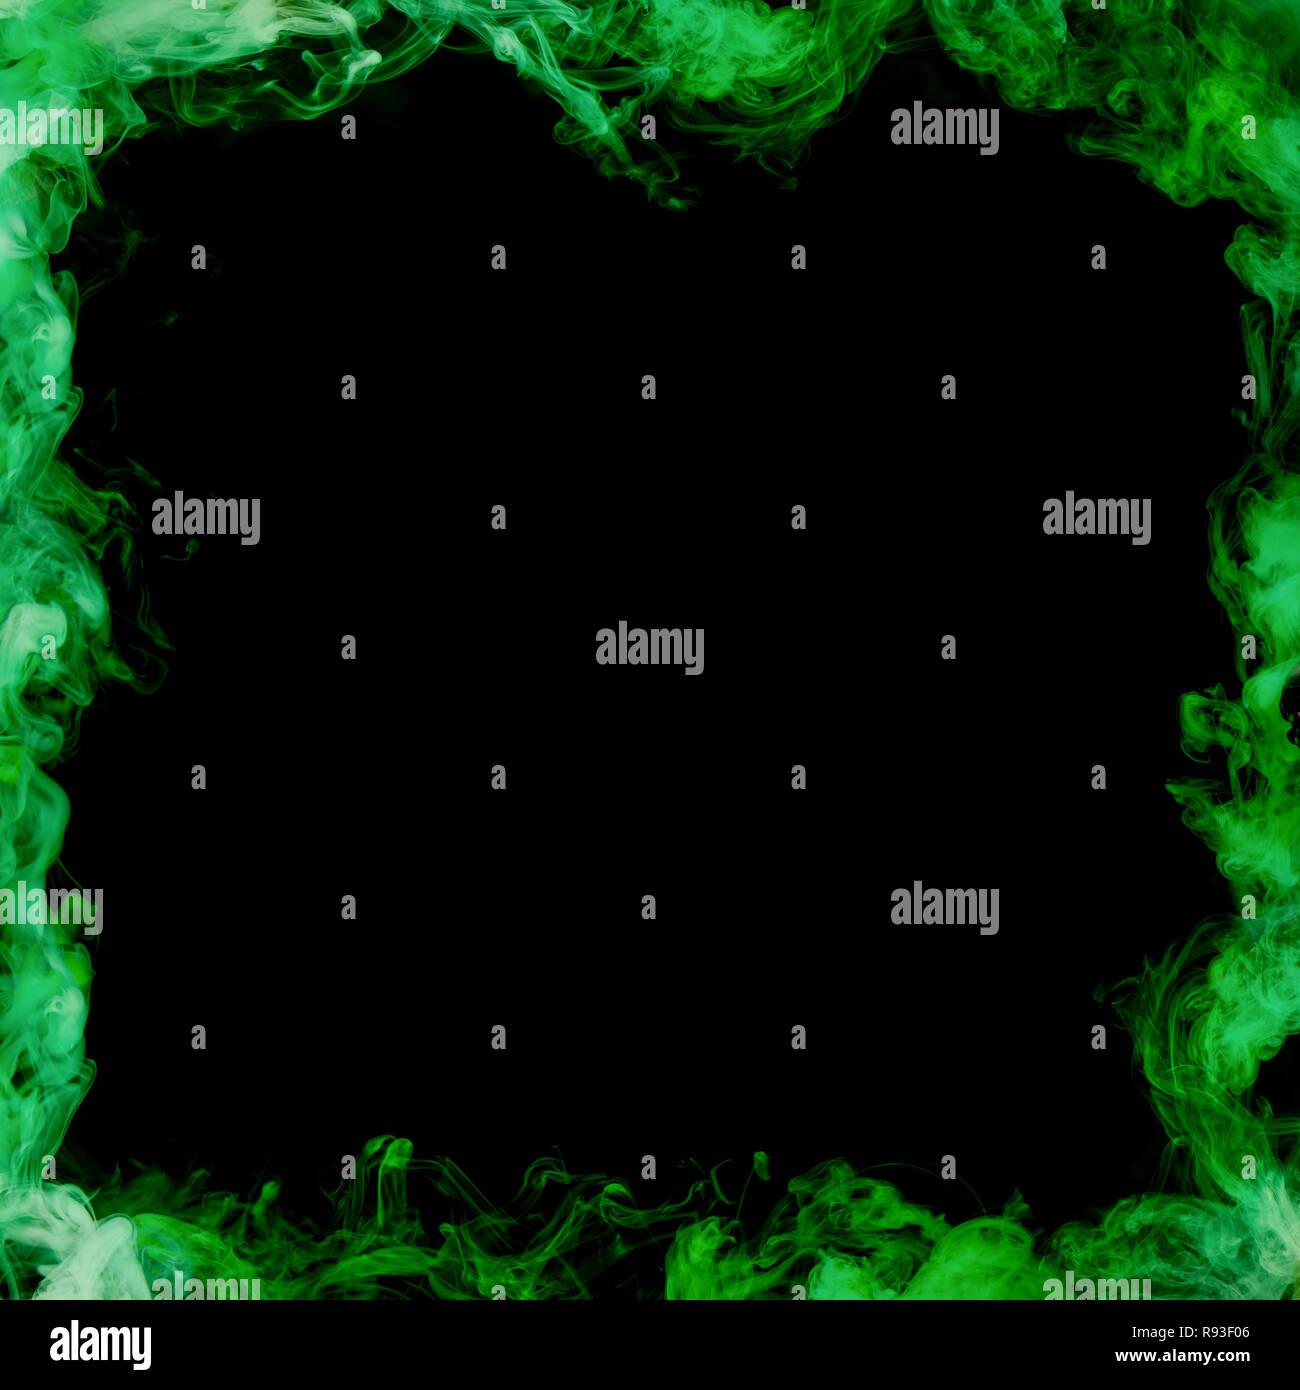 Bastidor de humo verde sobre fondo negro Imagen De Stock